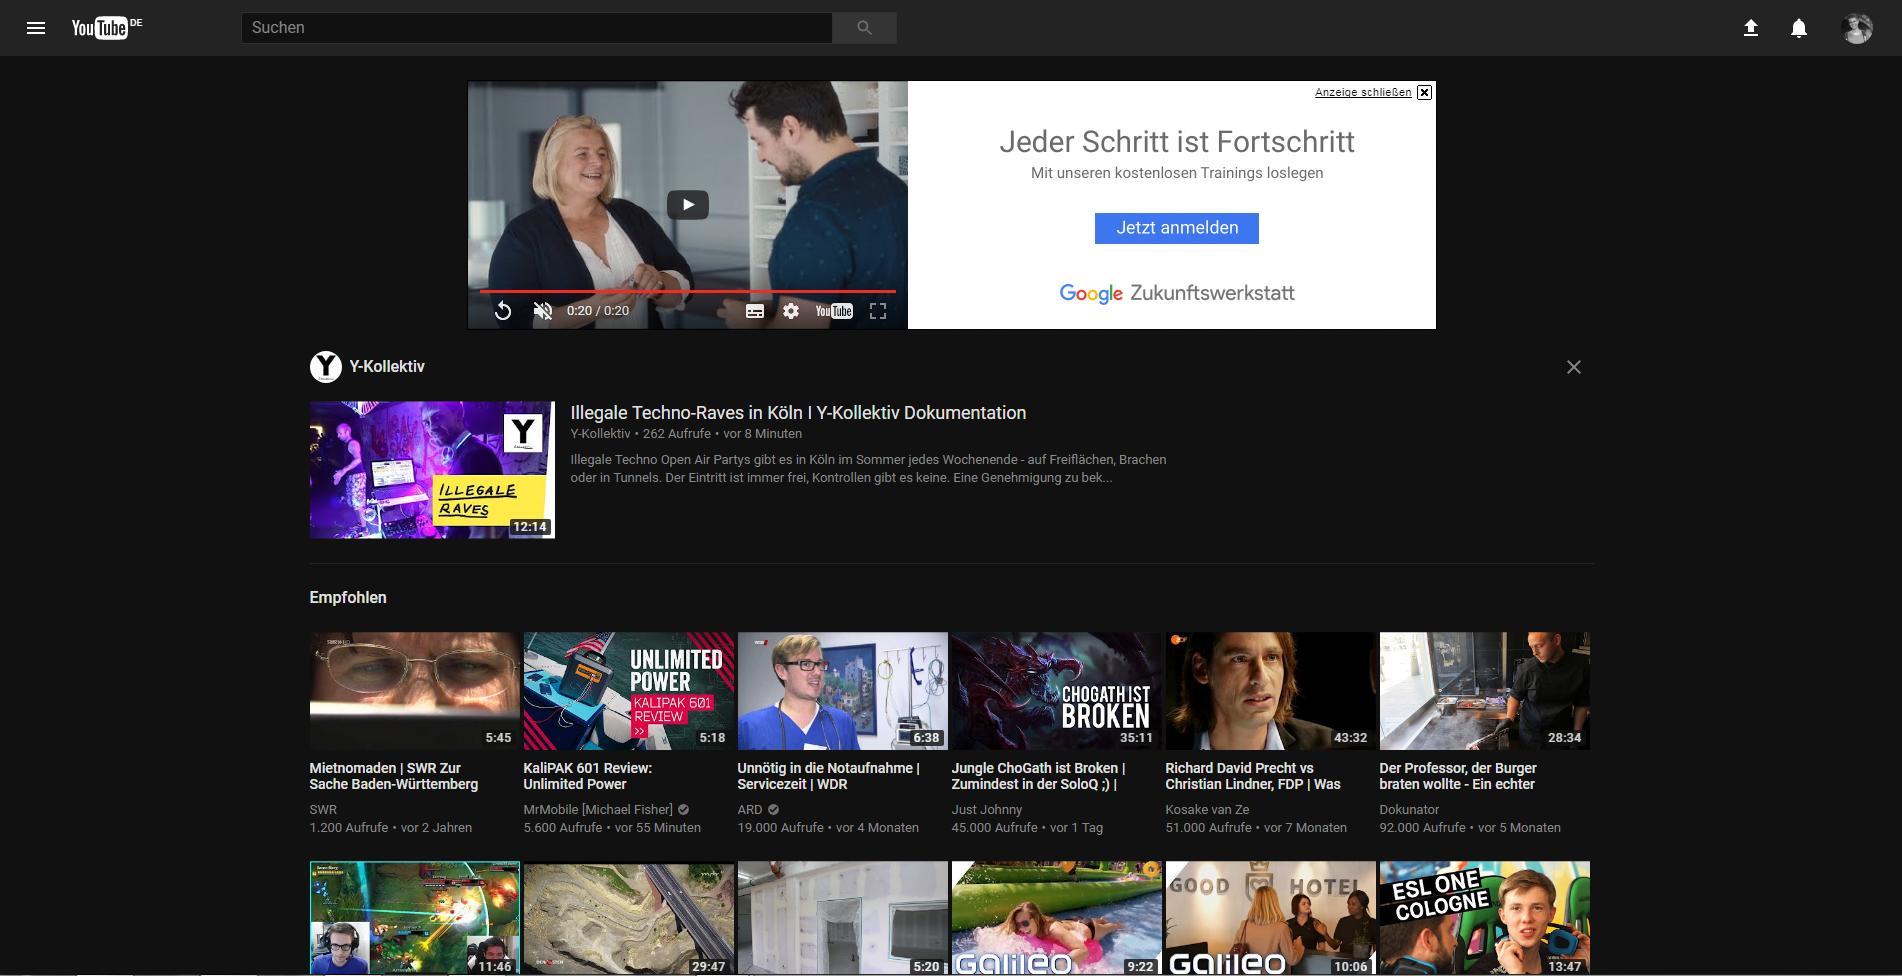 Neues YouTube Startseiten Design